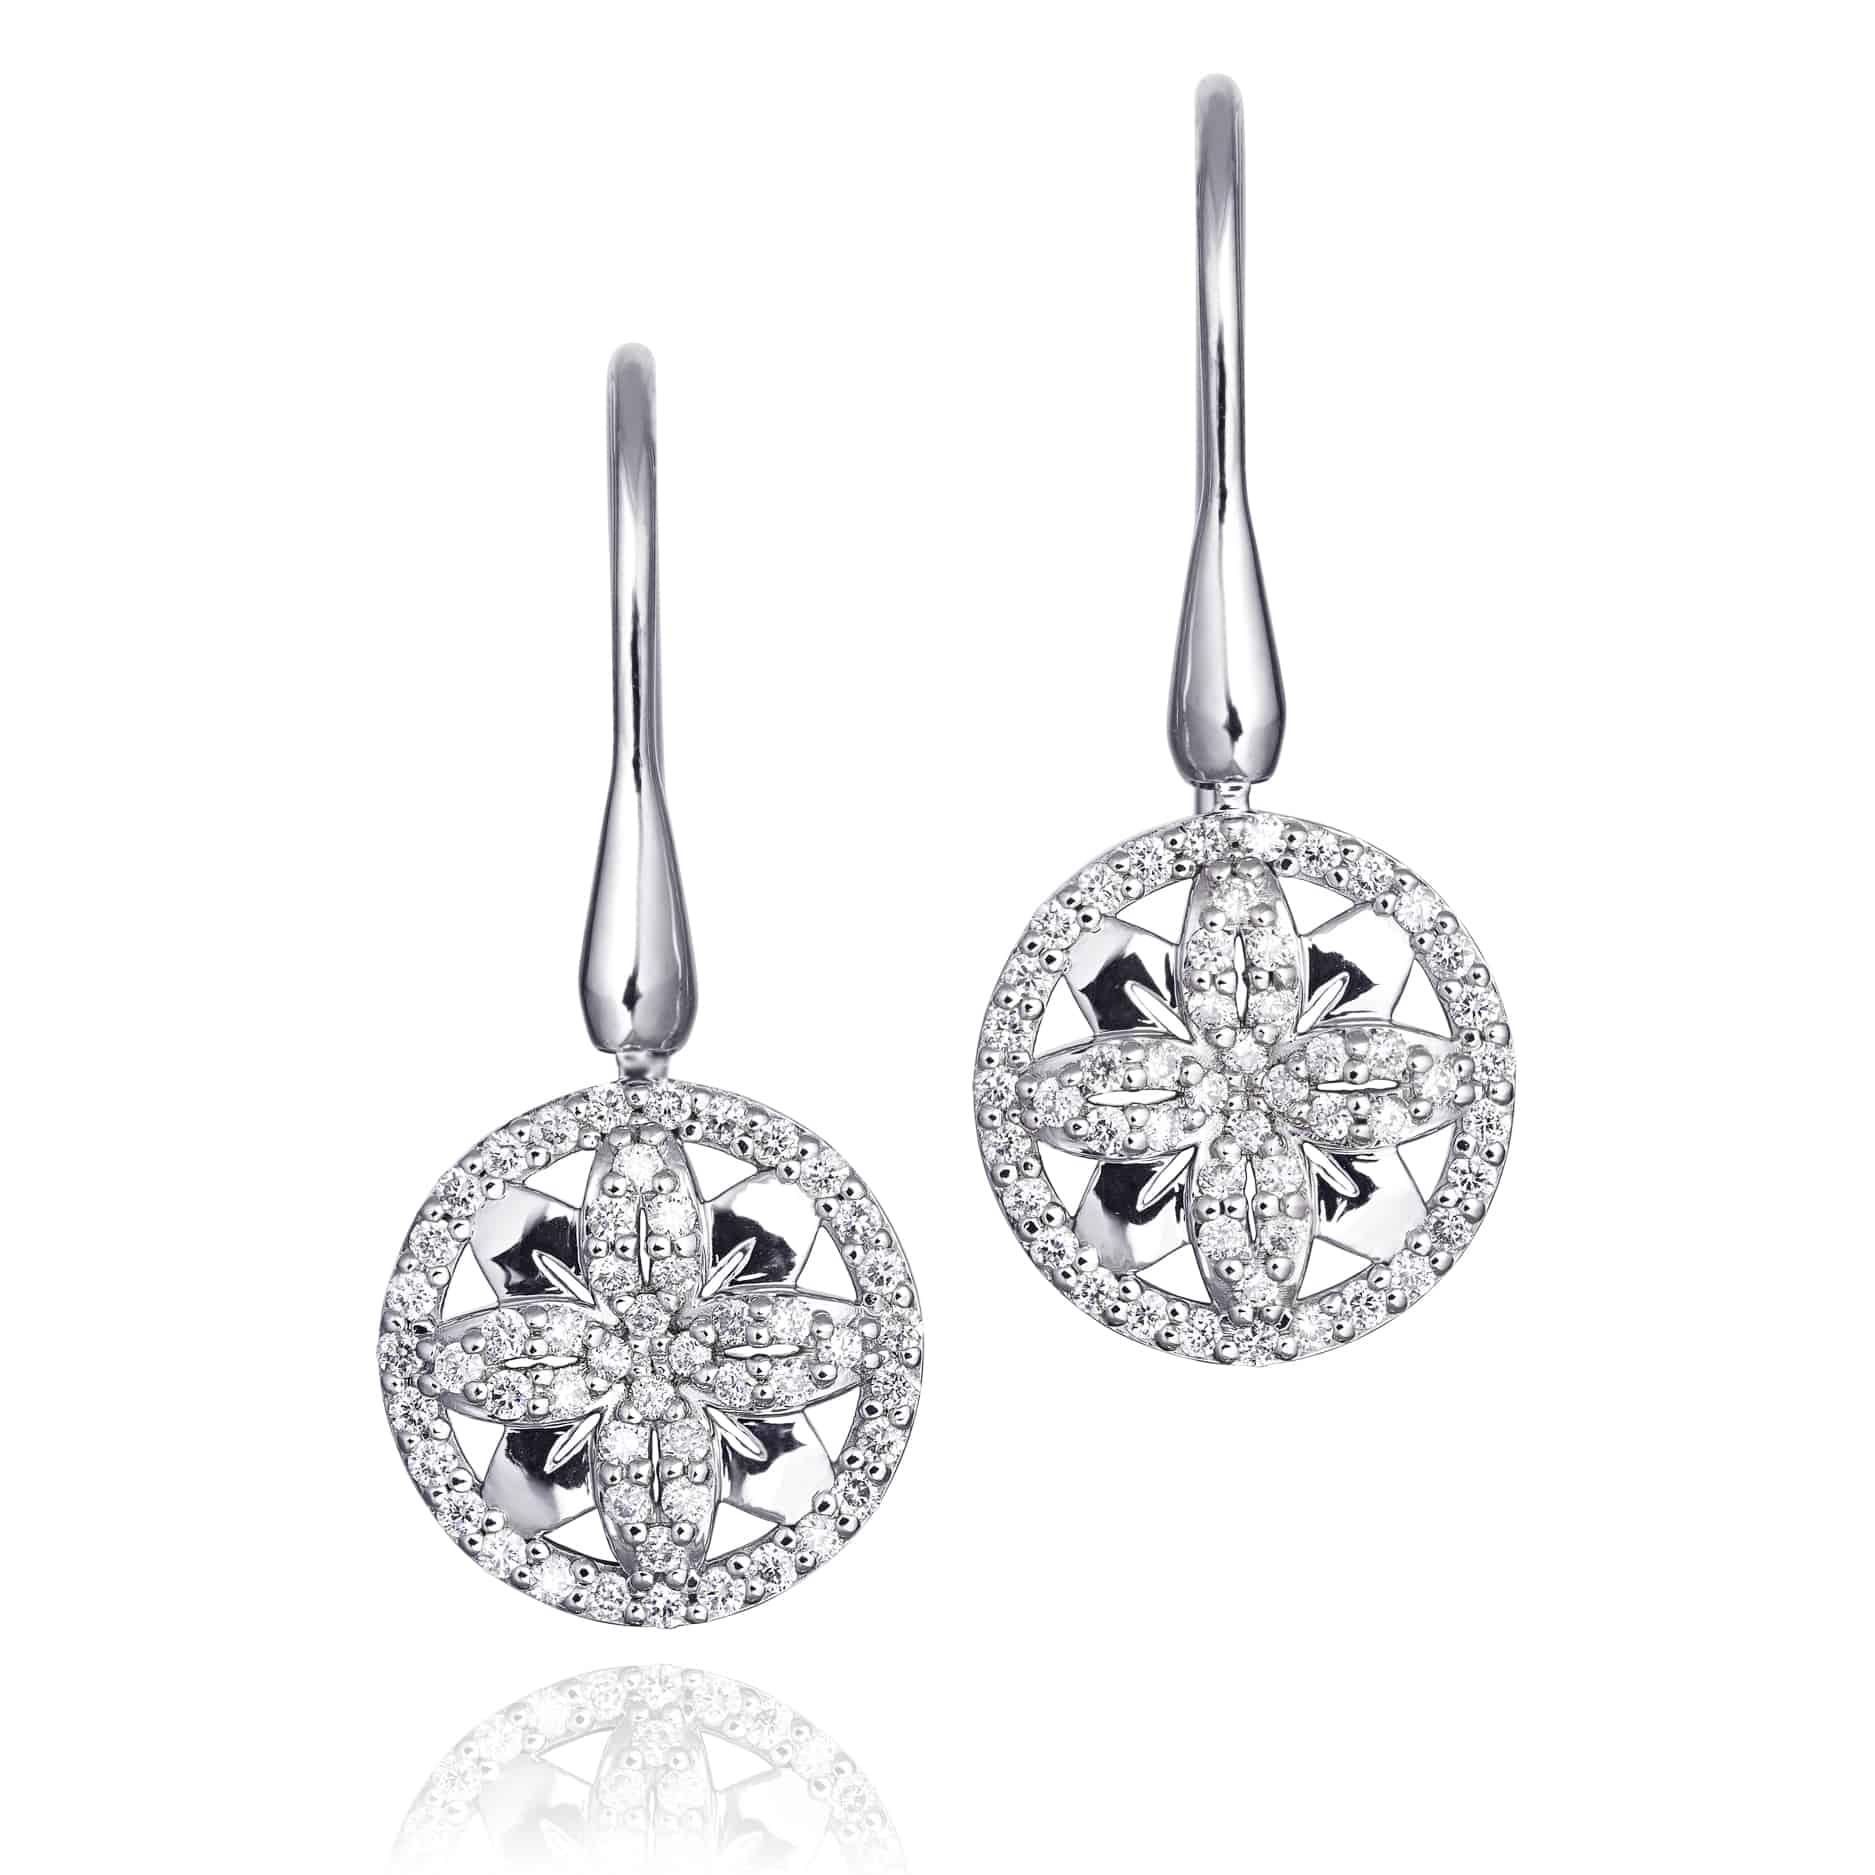 Ellipse Collection Diamond Drop Earrings